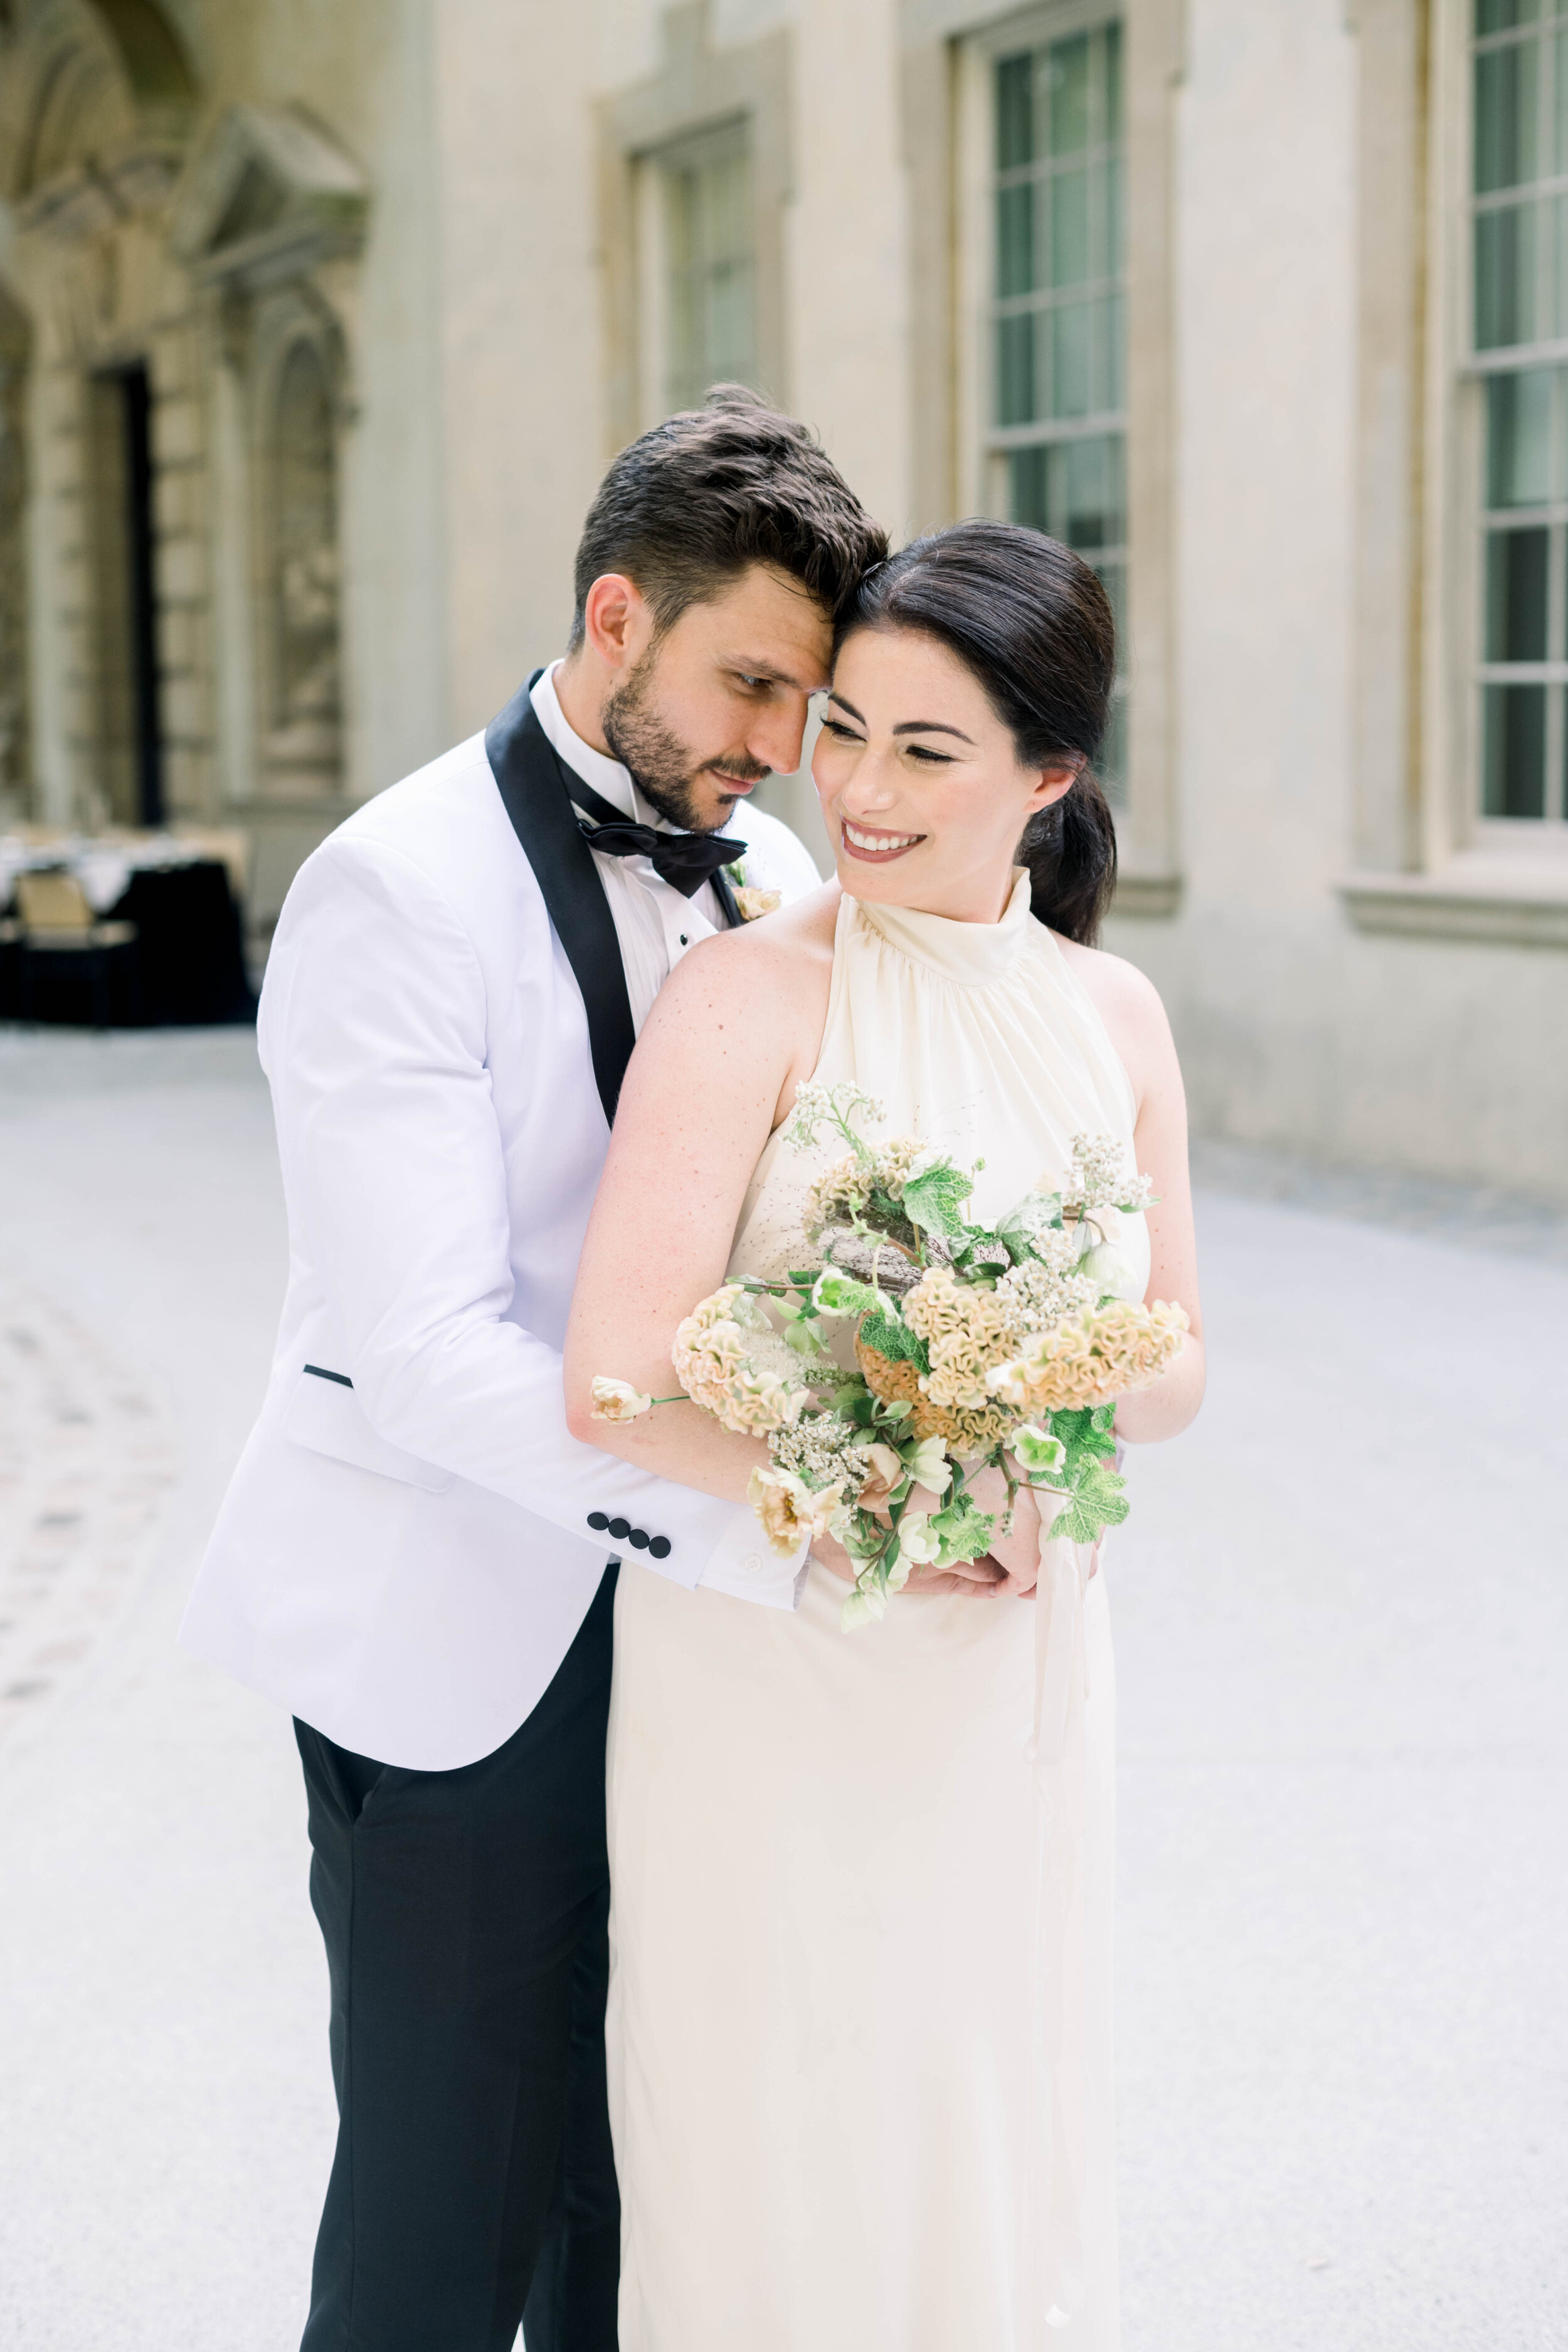 fine art wedding, Atlanta wedding, swan house wedding, modern wedding, rolls Royce wedding, swan house, high neck wedding dress, white tux, first dance